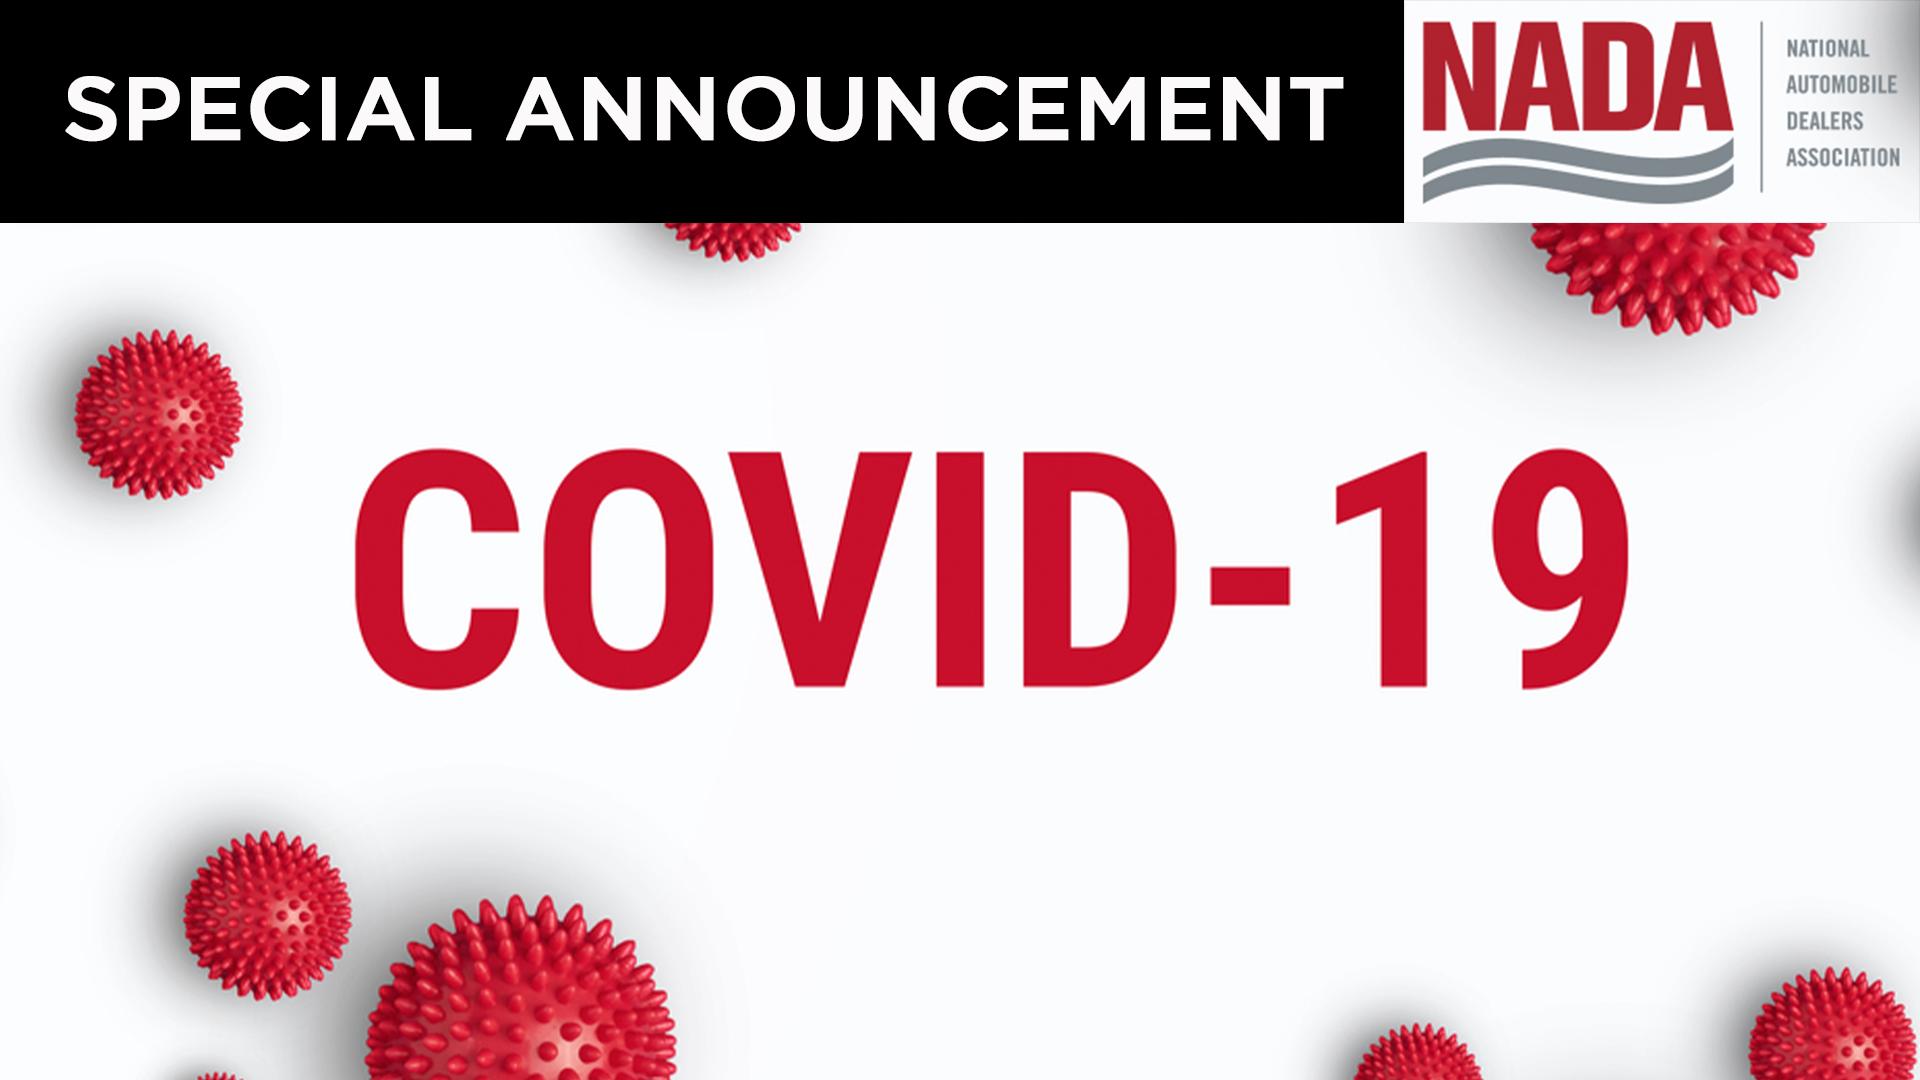 A Statement from NADA on the Coronavirus